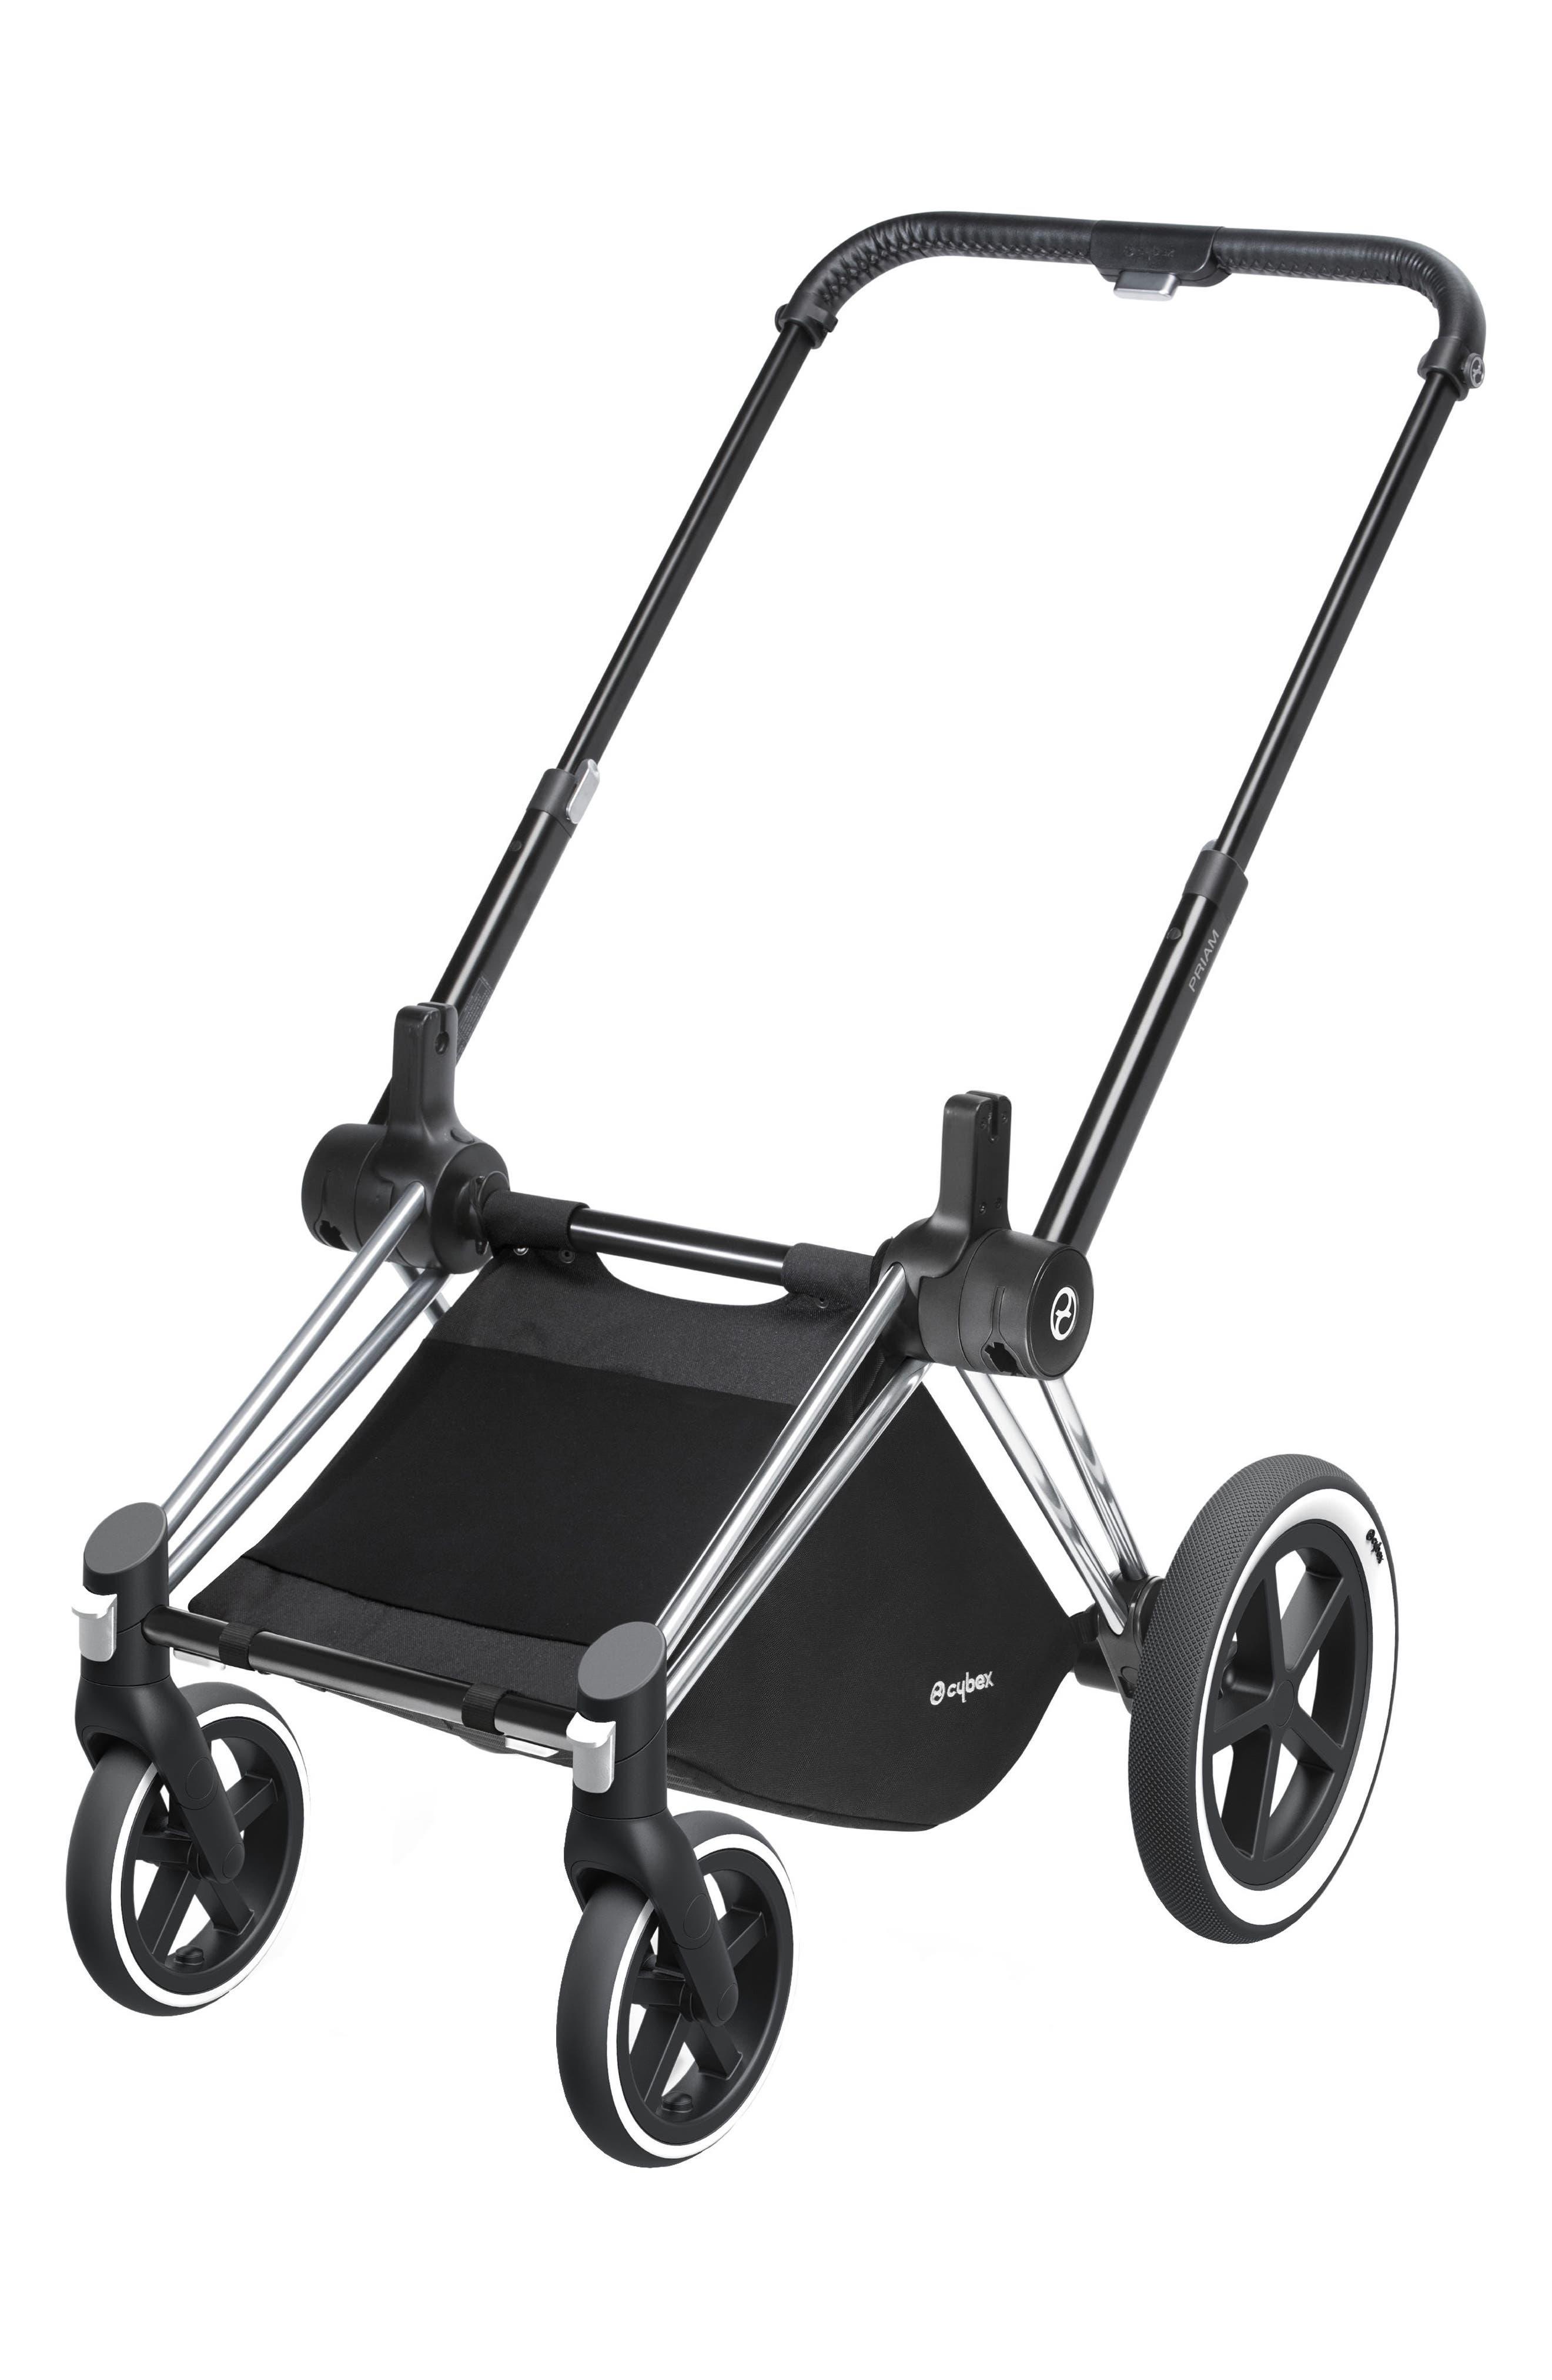 Priam Stroller Frame with All Terrain Wheels,                         Main,                         color, ALL TERRAIN